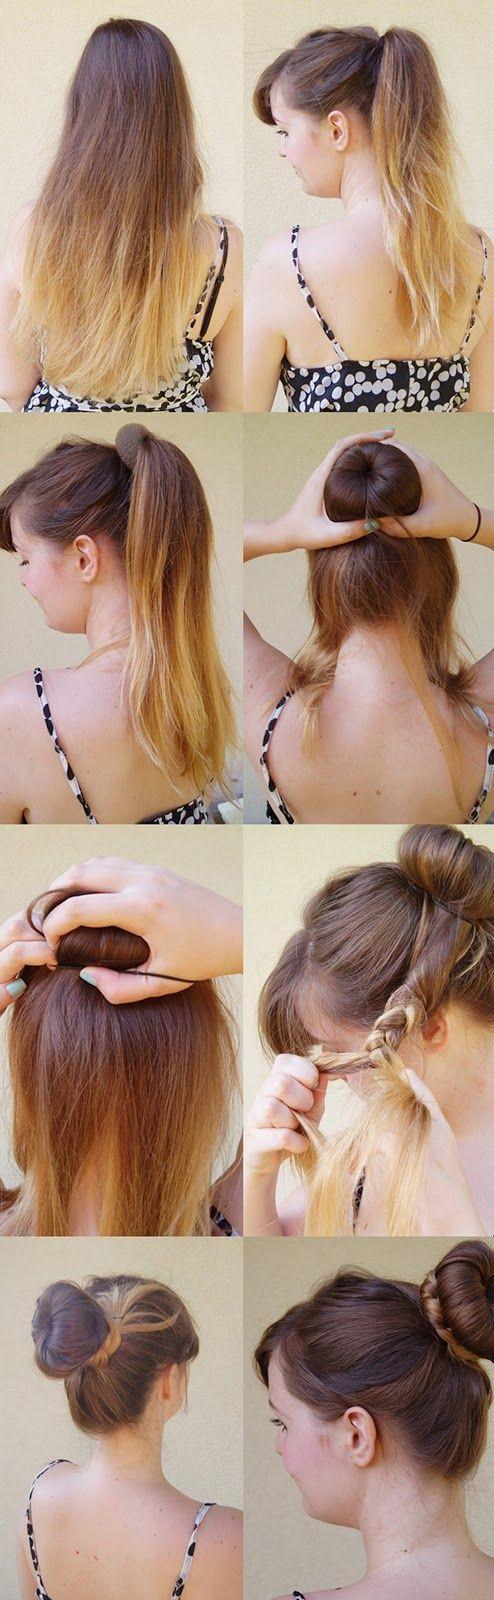 Fine 1000 Ideas About Donut Bun Hairstyles On Pinterest Donut Bun Short Hairstyles For Black Women Fulllsitofus